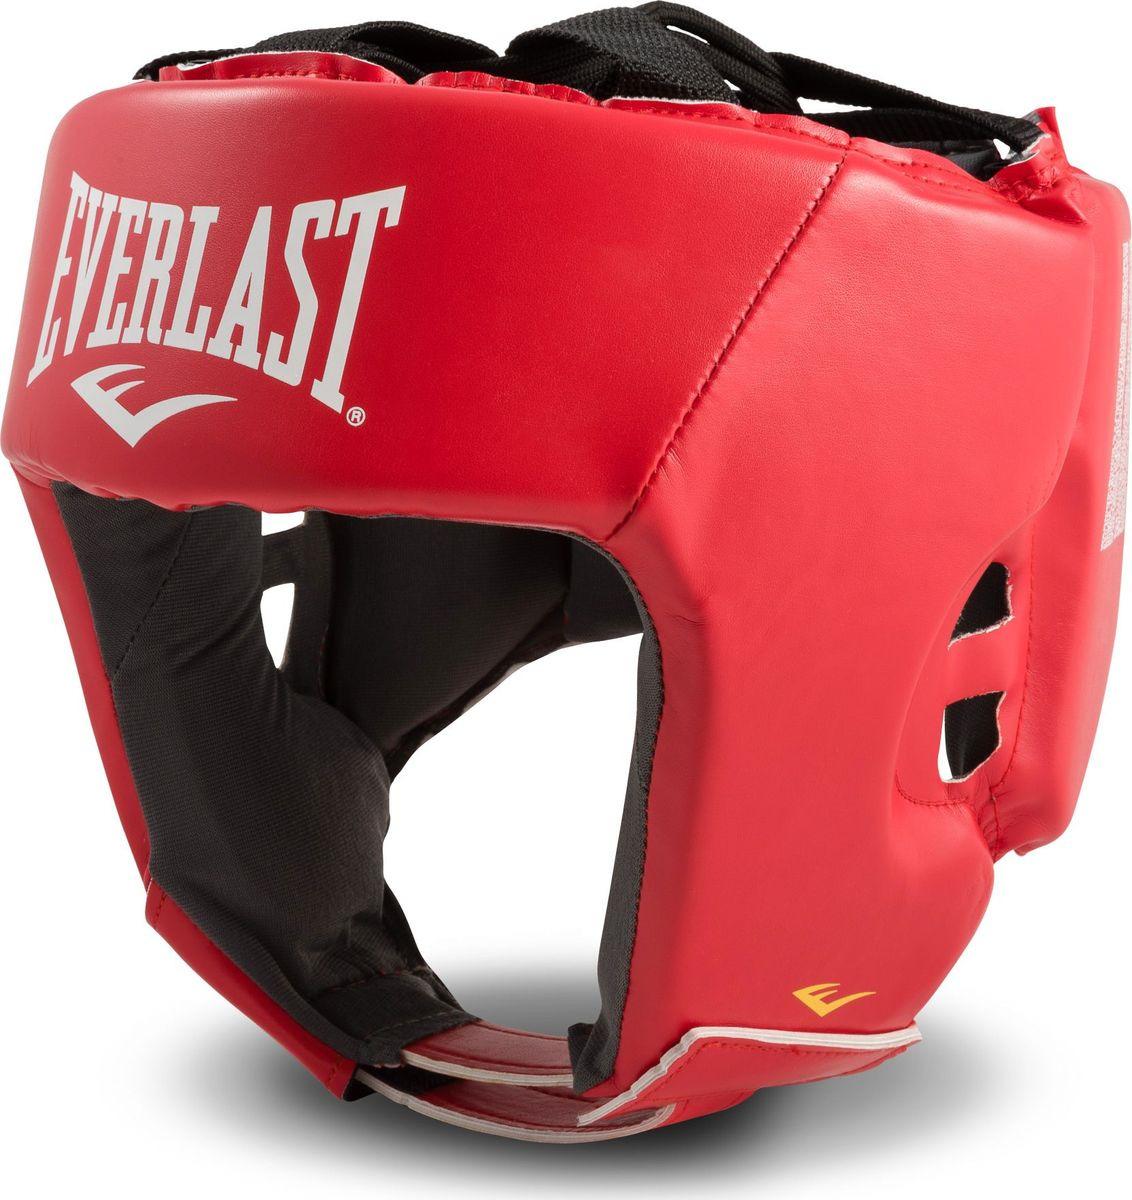 Шлем боксерский Everlast Amateur Competition, 610600-10 PU, красный, размер XL шлем боксерский rsc pu bf bx 208 00026585 красный размер xl